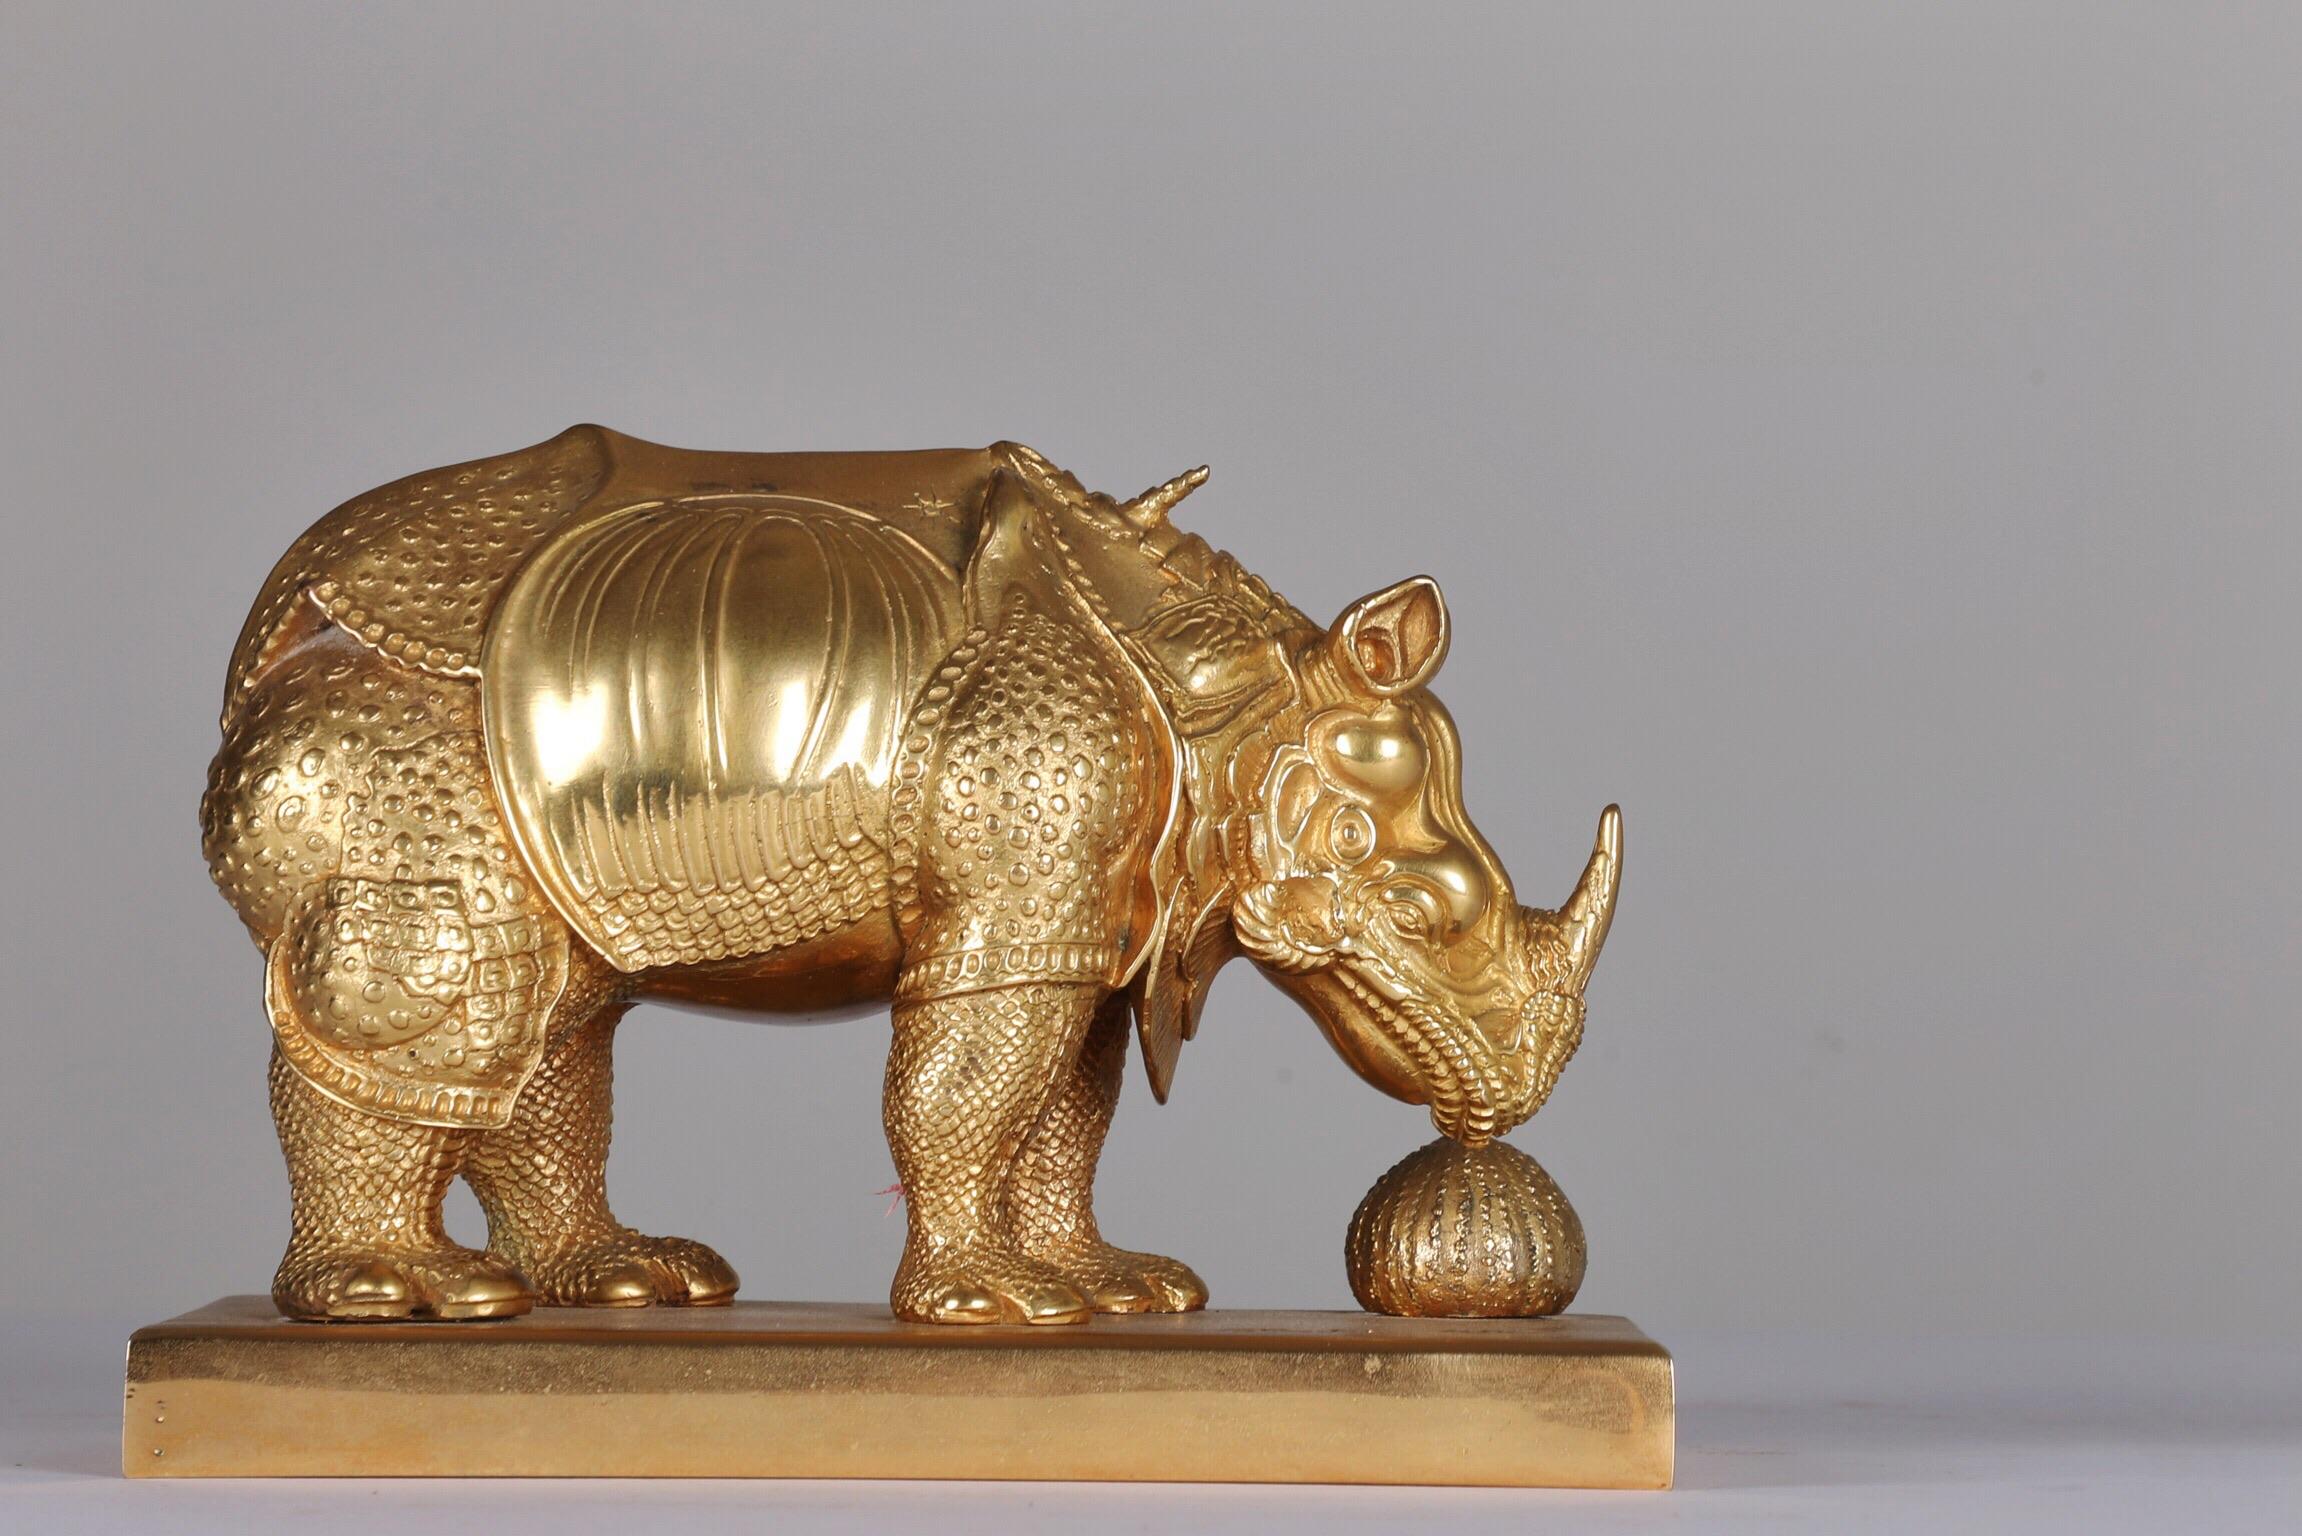 Petit Rhino En Dentelles Dore - 1954Bronze and gold leaf 22 carats16/350H: 11.7 cm